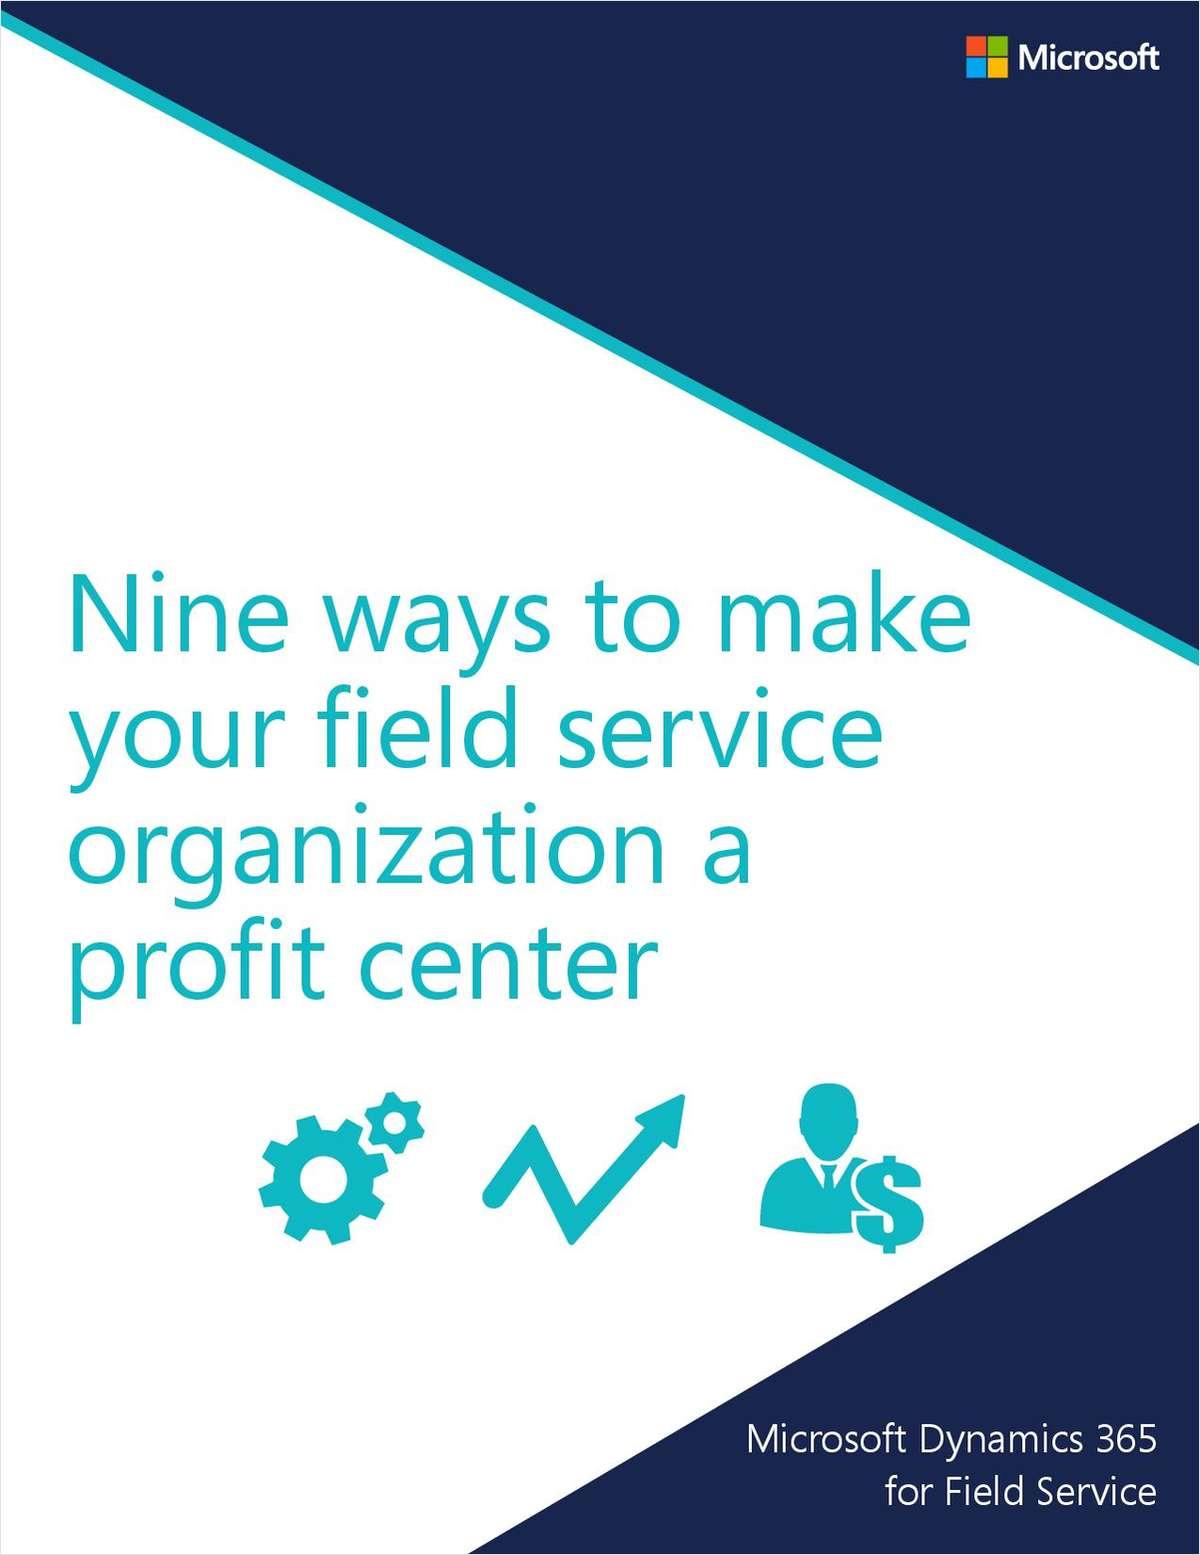 9 Ways to Make Your Field Service Organization a Profit Center